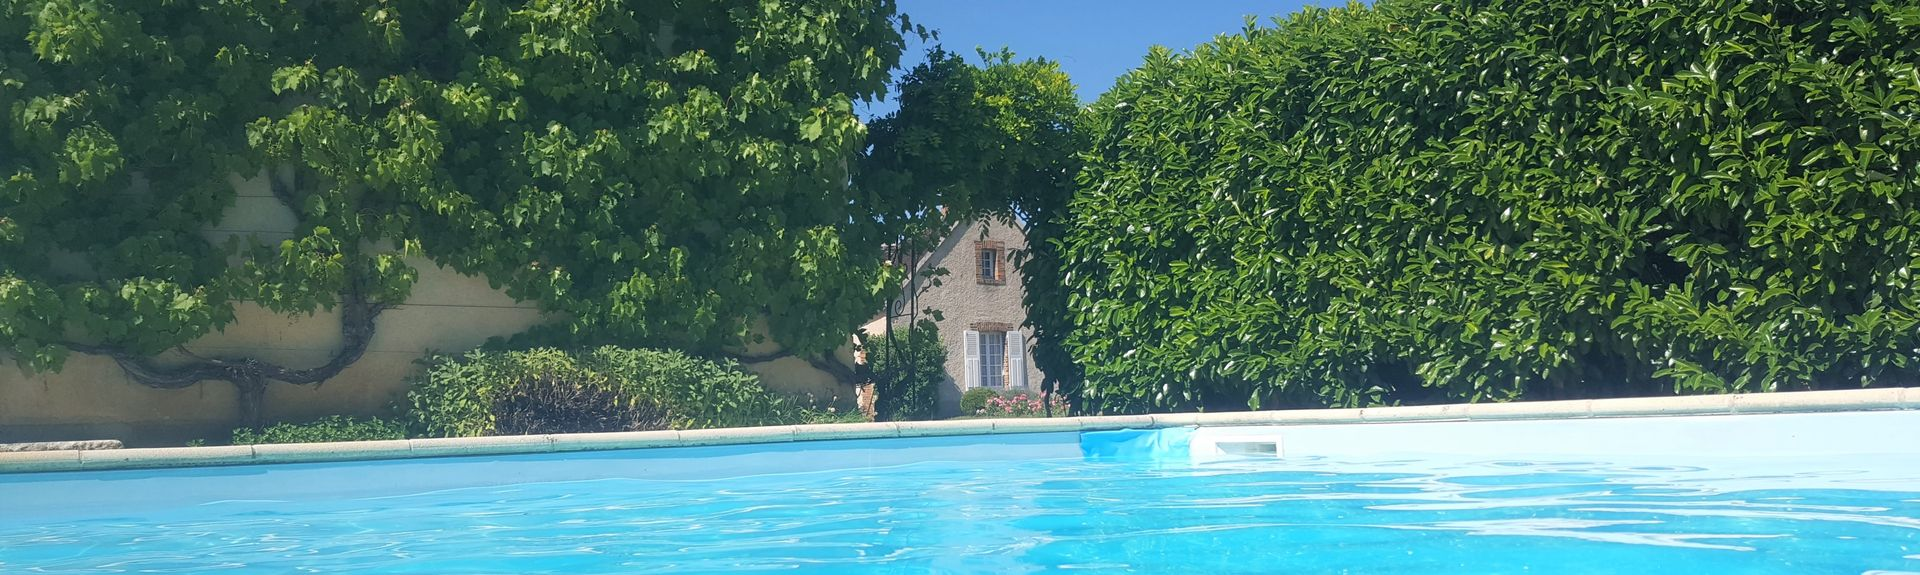 Mere, Yonne, France